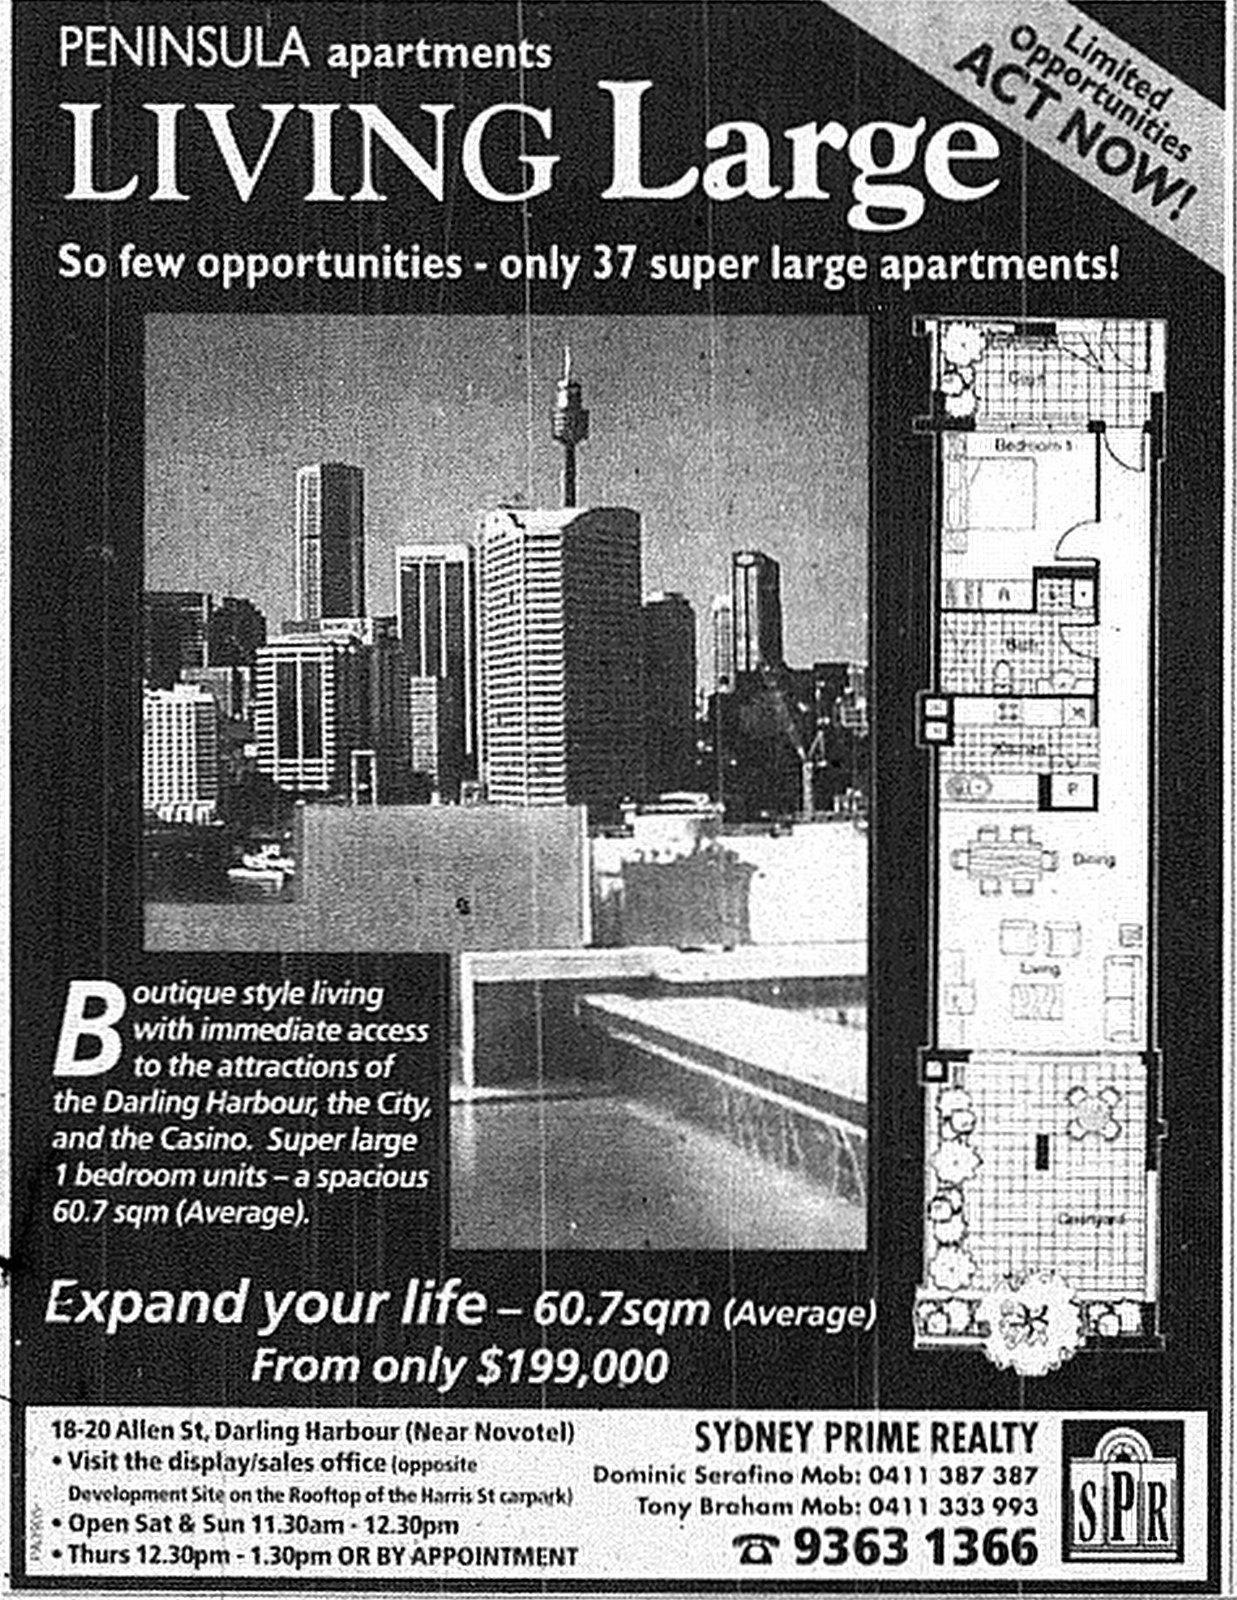 Peninsula Apartments Pyrmont June 11 1998 SMH 17RE